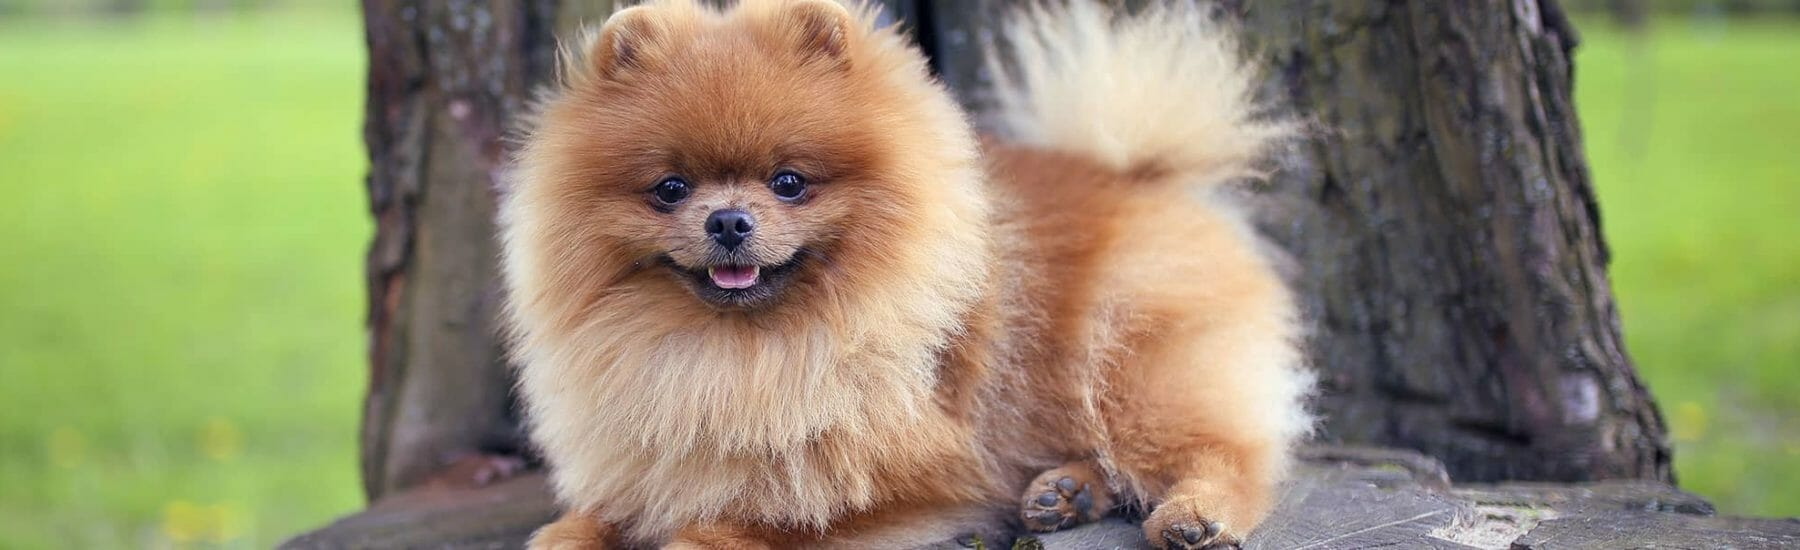 Small fluffy dog sitting on a tree stump